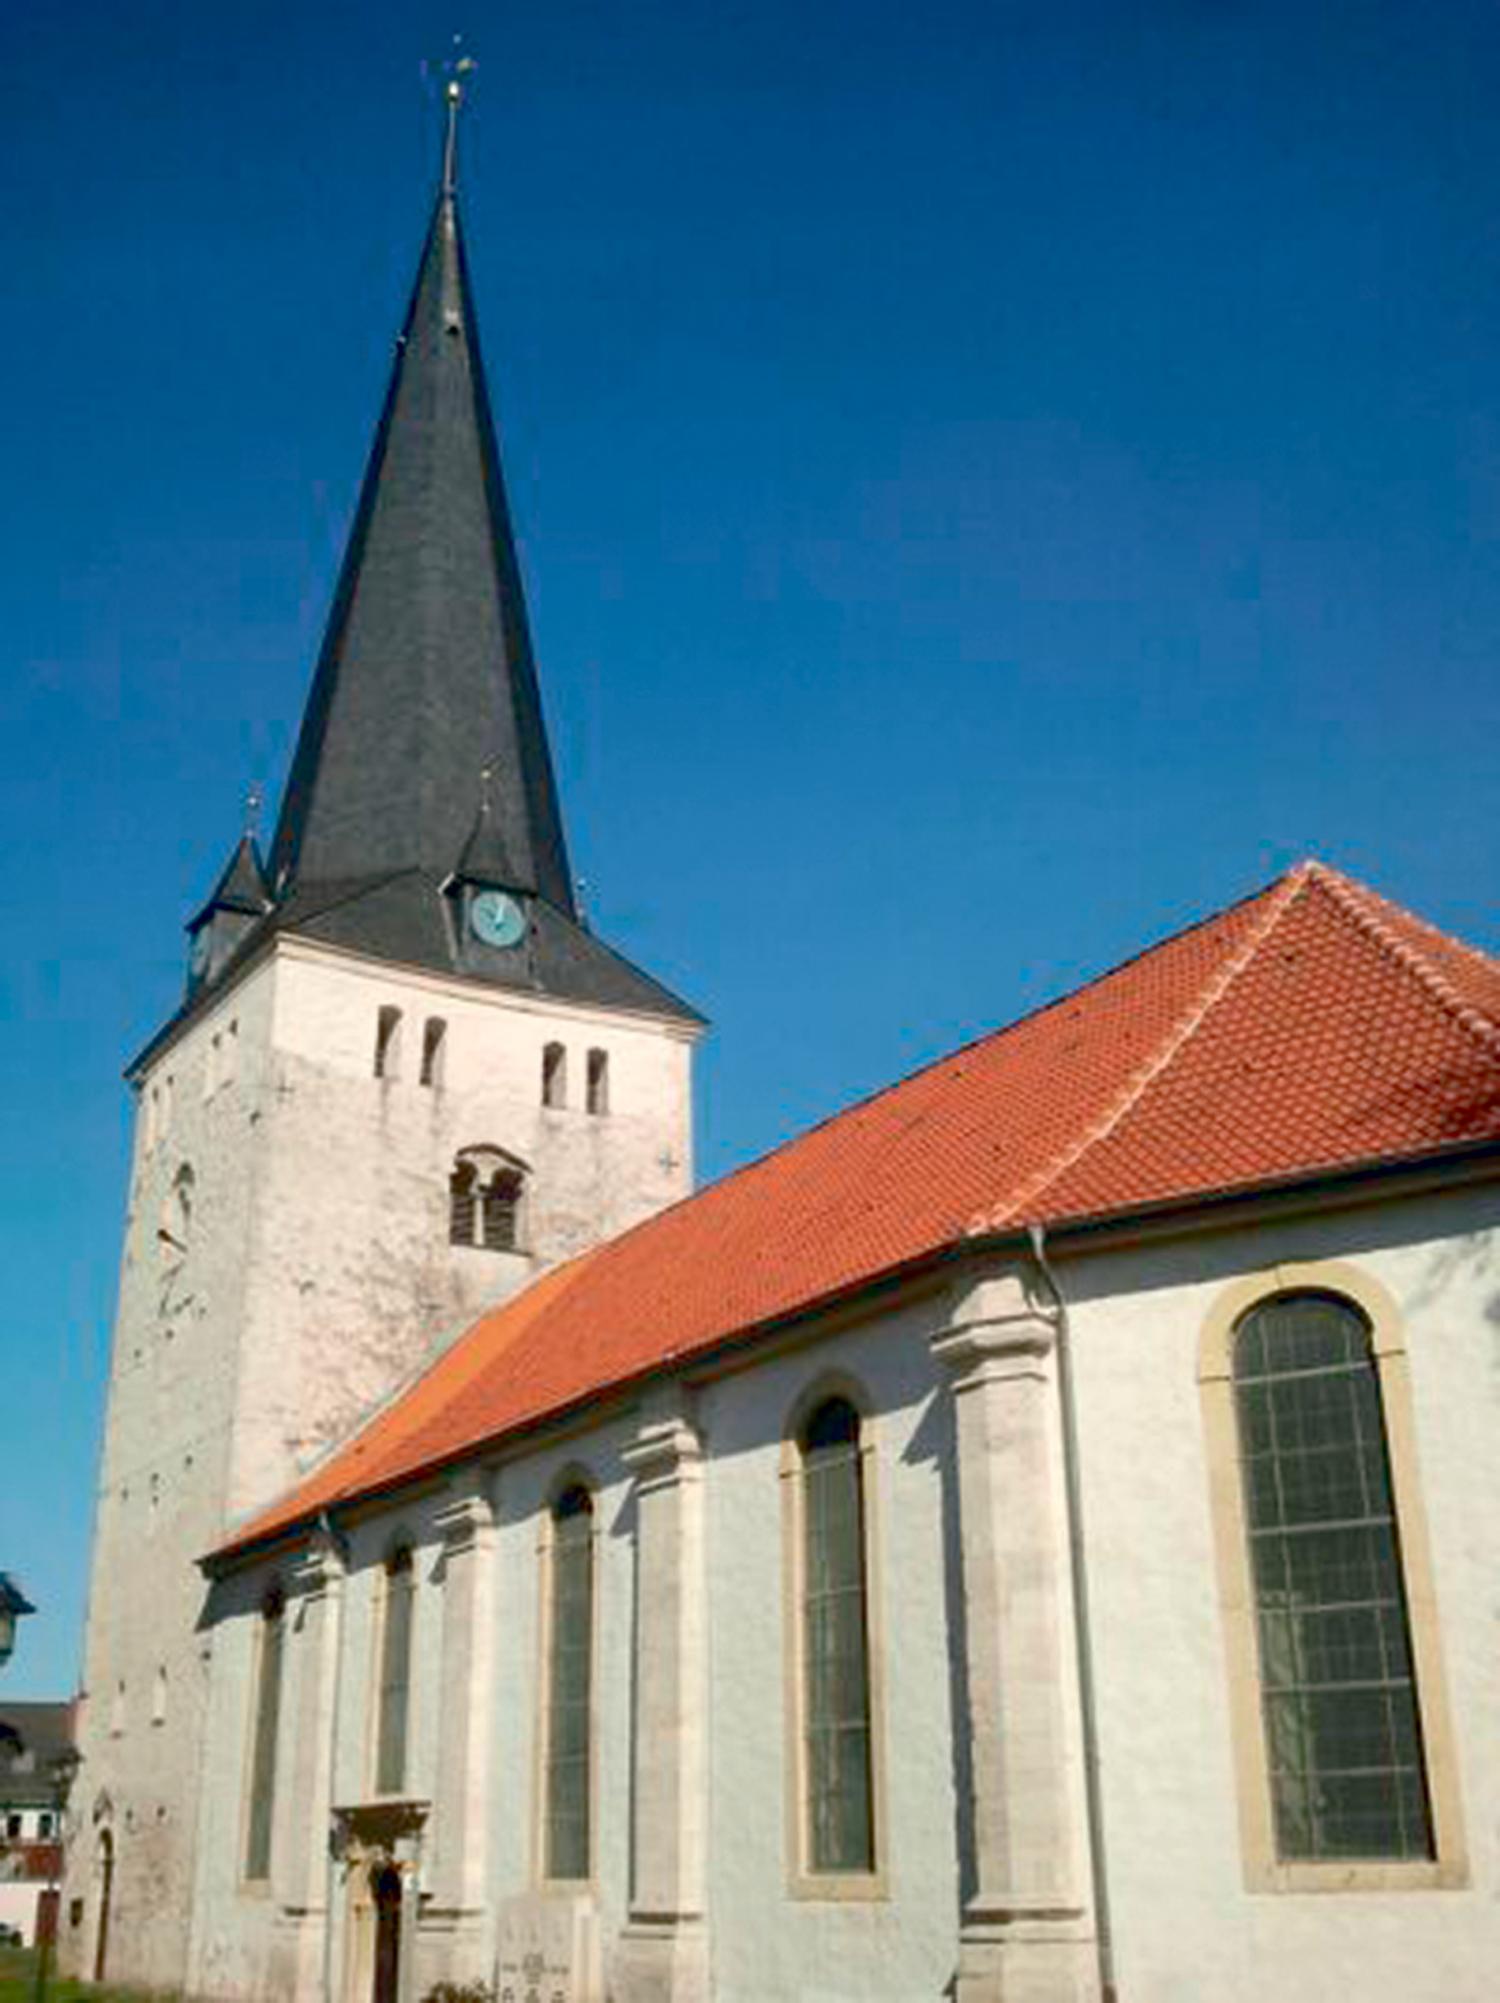 Kirche St.Stephanus in Schöppenstedt